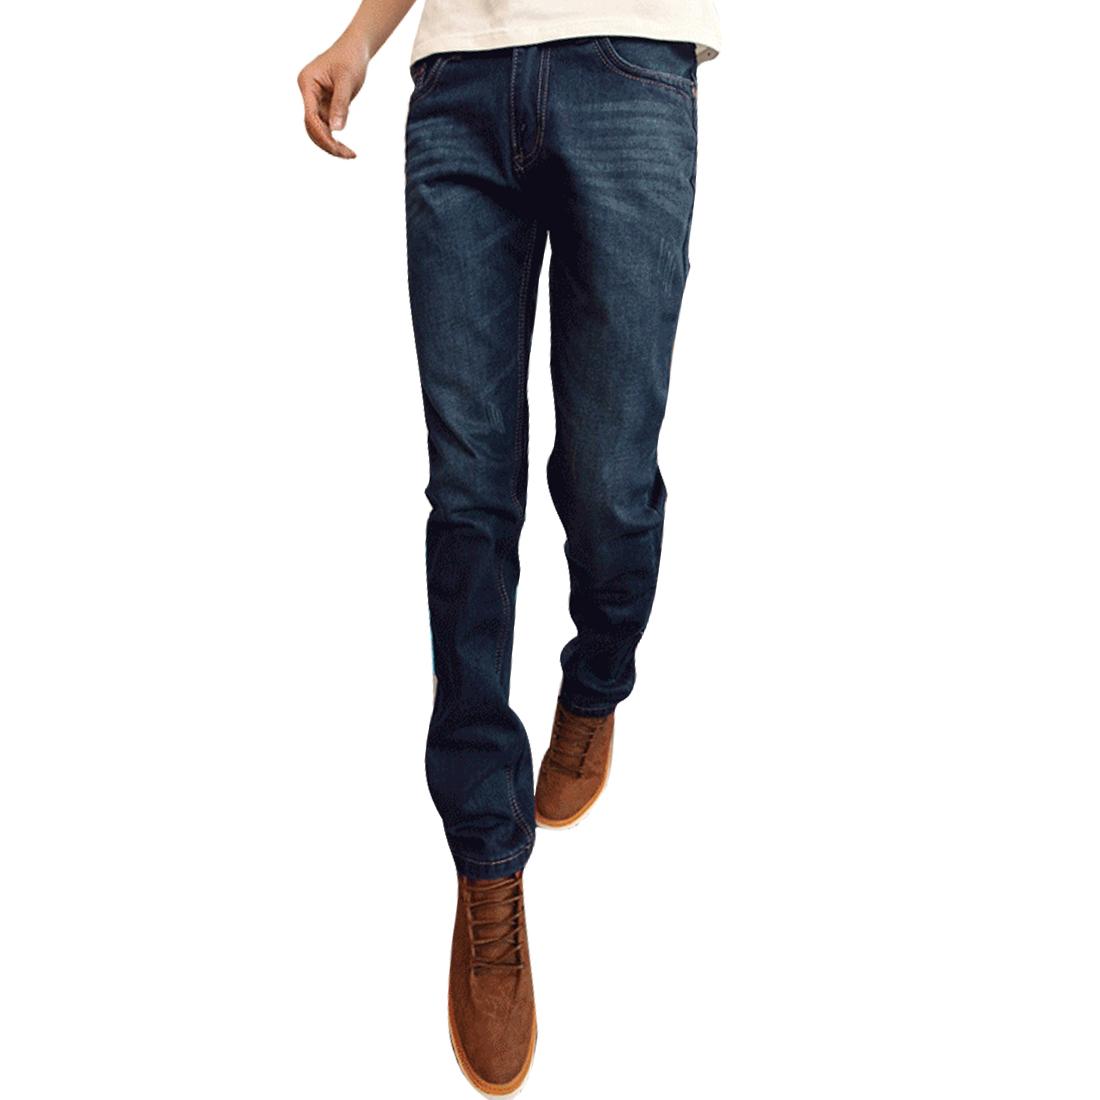 Men Belt Loops Zipper Fly Button Closure Slim Fit Jeans Pants Blue W36